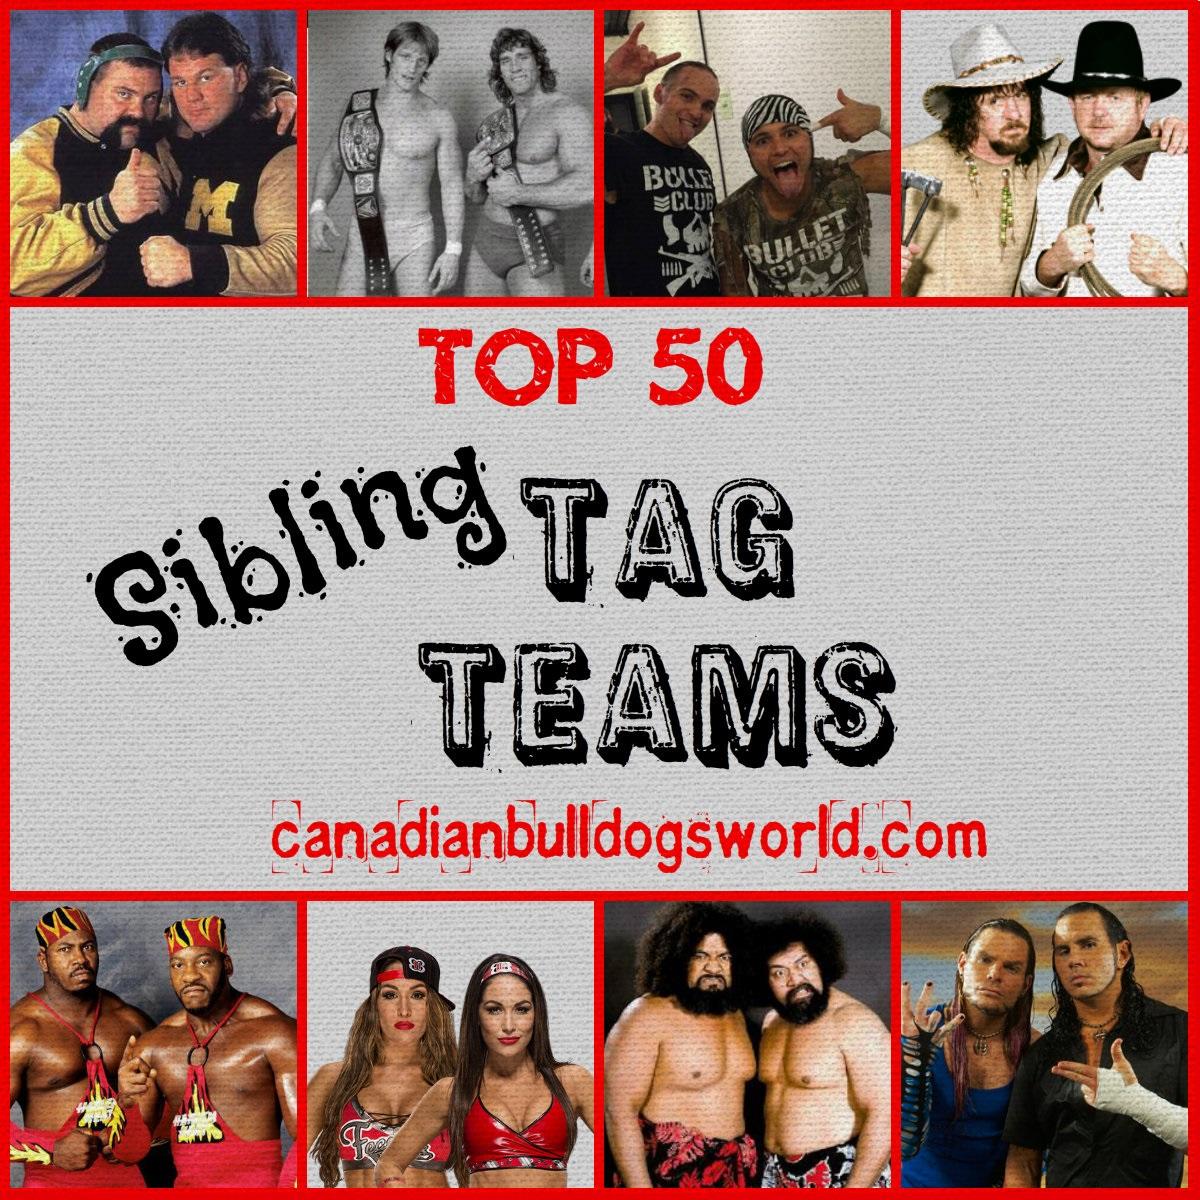 Top 50 Sibling Tag Teams